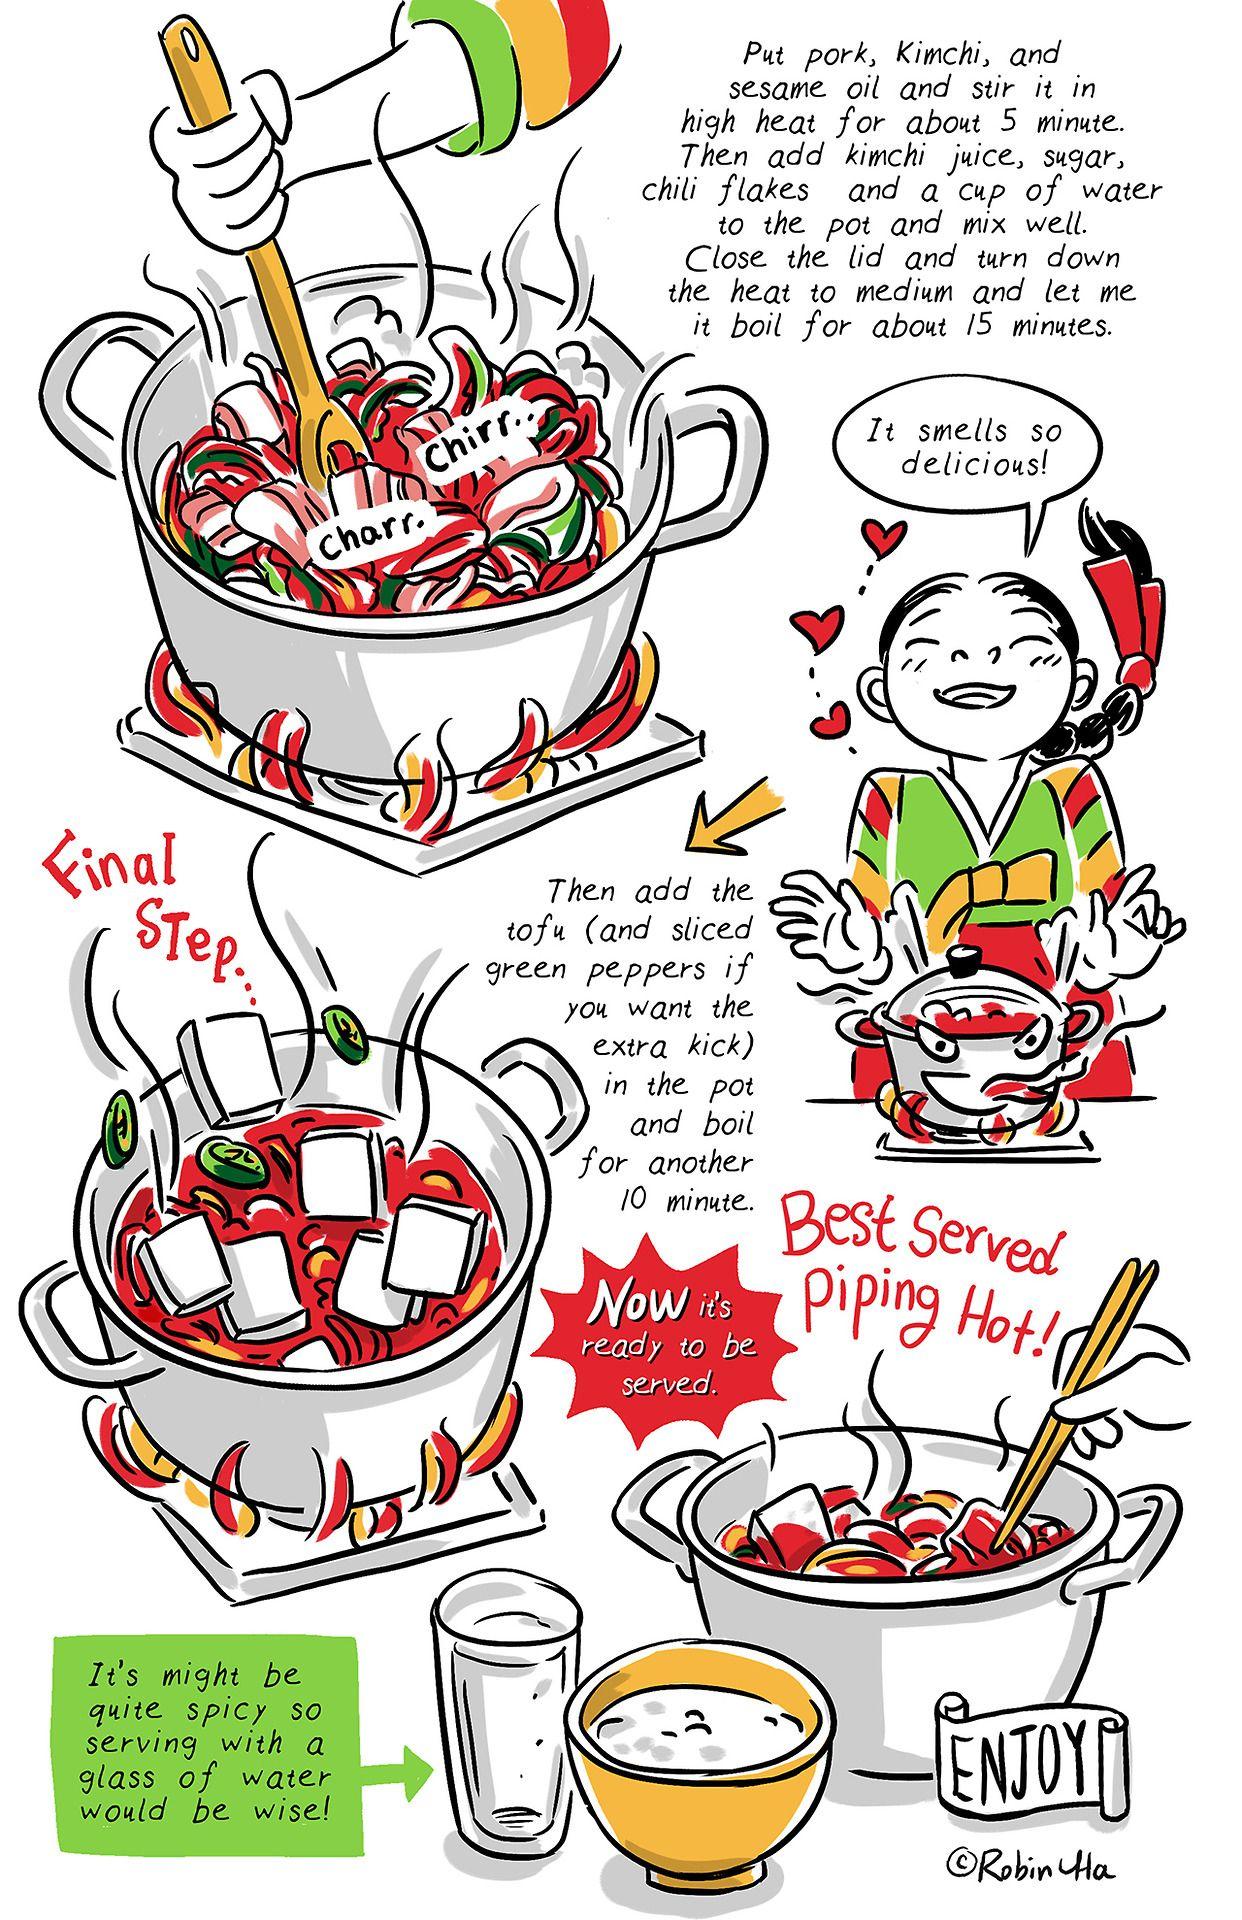 Banchan korean recipe comics snack pinterest korean banchan korean recipe comics forumfinder Gallery